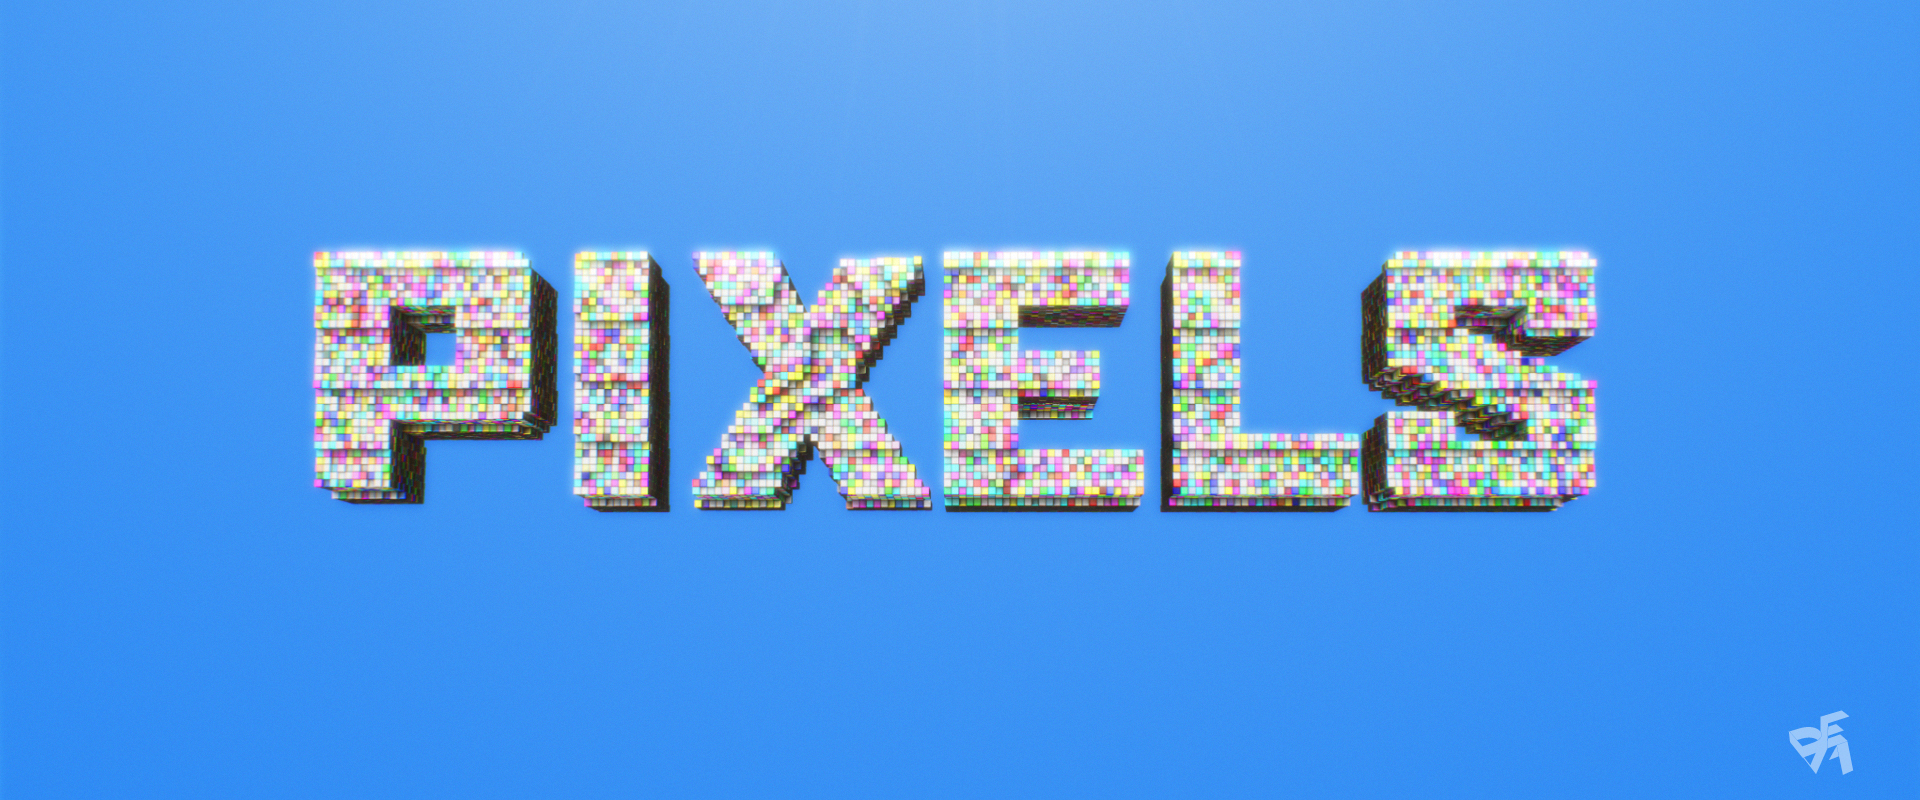 Pixels-STYLEFRAME_03.jpg